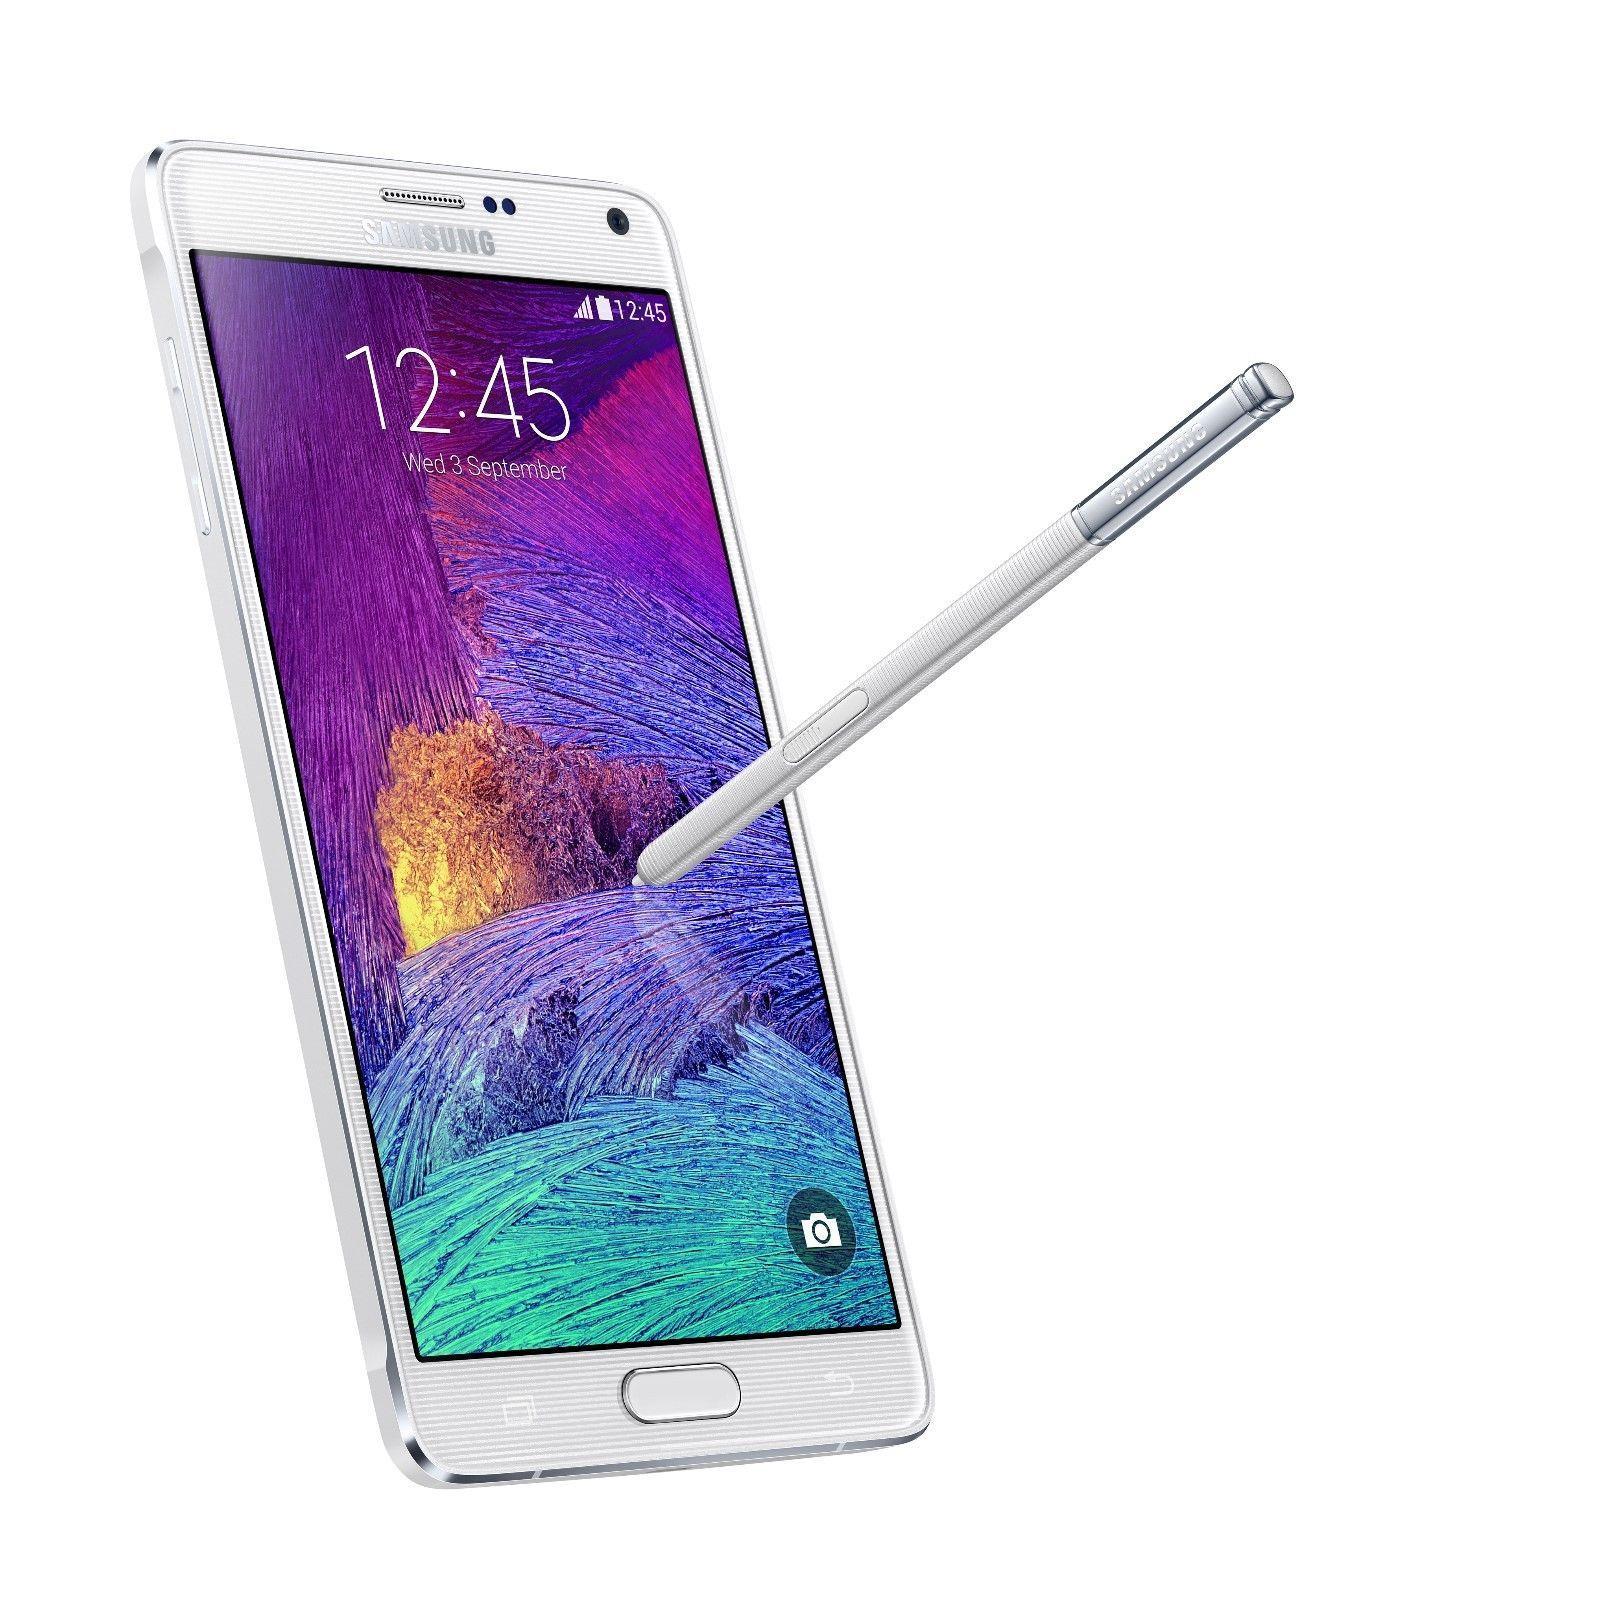 "Smartphone 5.7"" Samsung Galaxy Note 4 N910V - 32 Go, Blanc (Livraison et taxes comprises)"